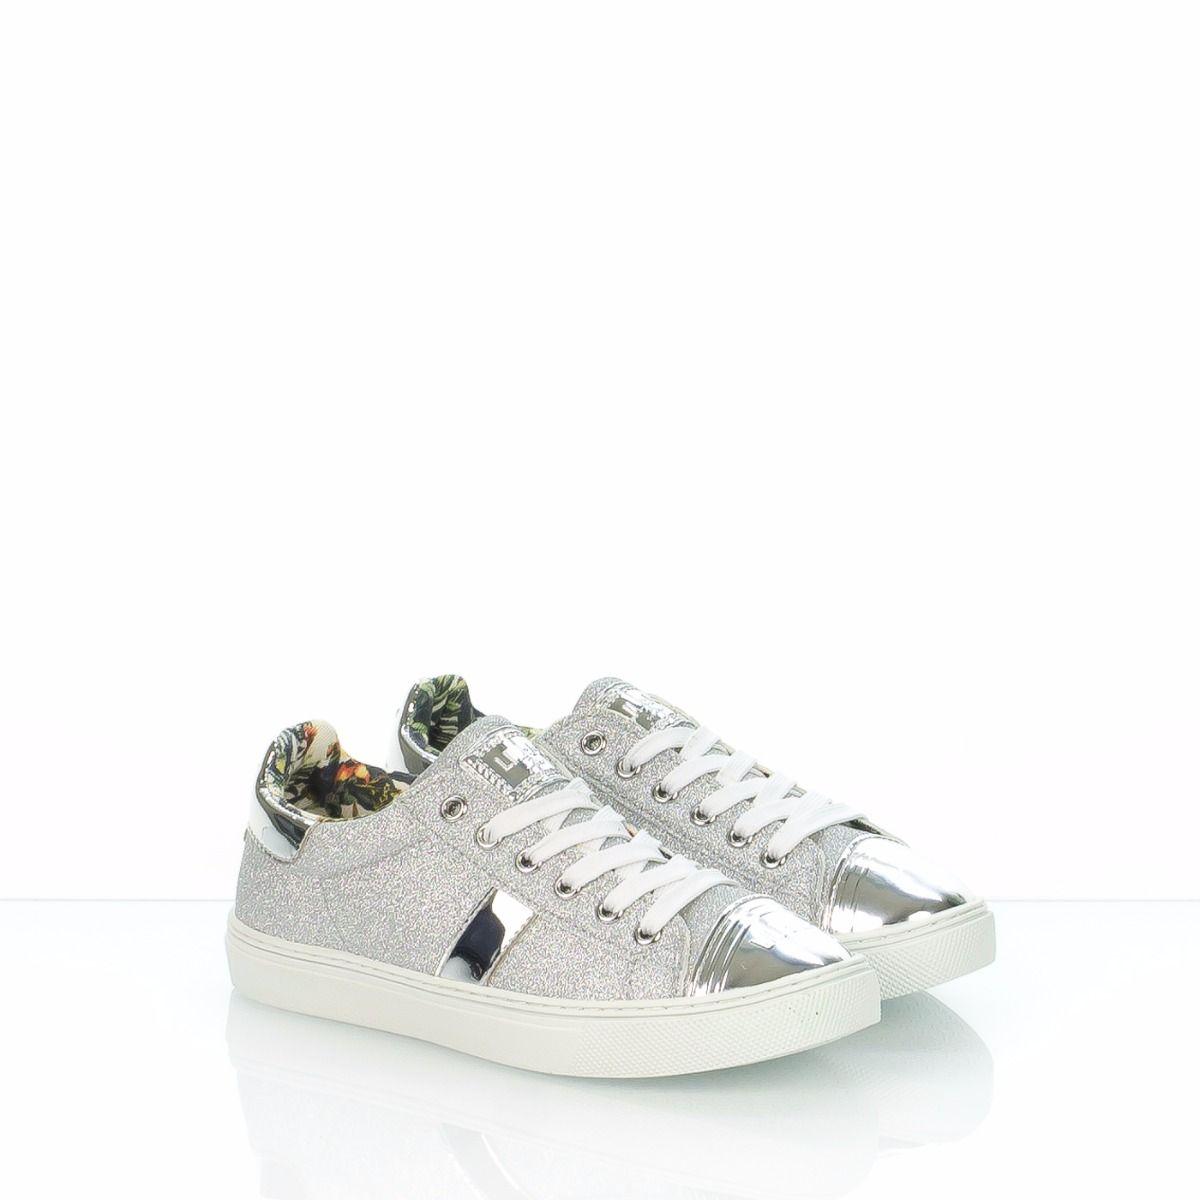 detailed look 8dc30 bee0d LIU JO 22922A|sneakers bambina|glitter|argento|Spedizione ...